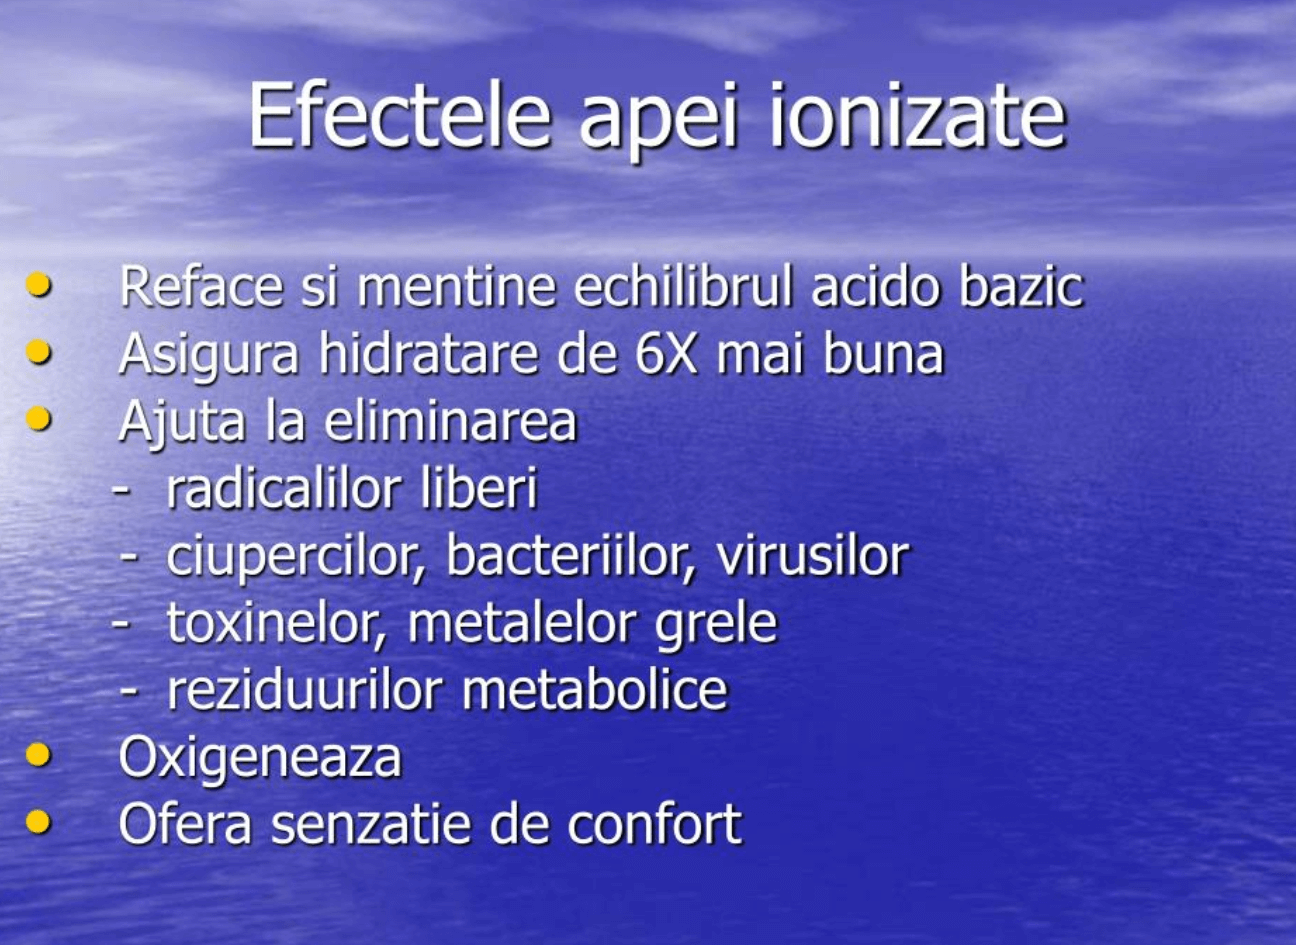 Beneficiile apei ionizate